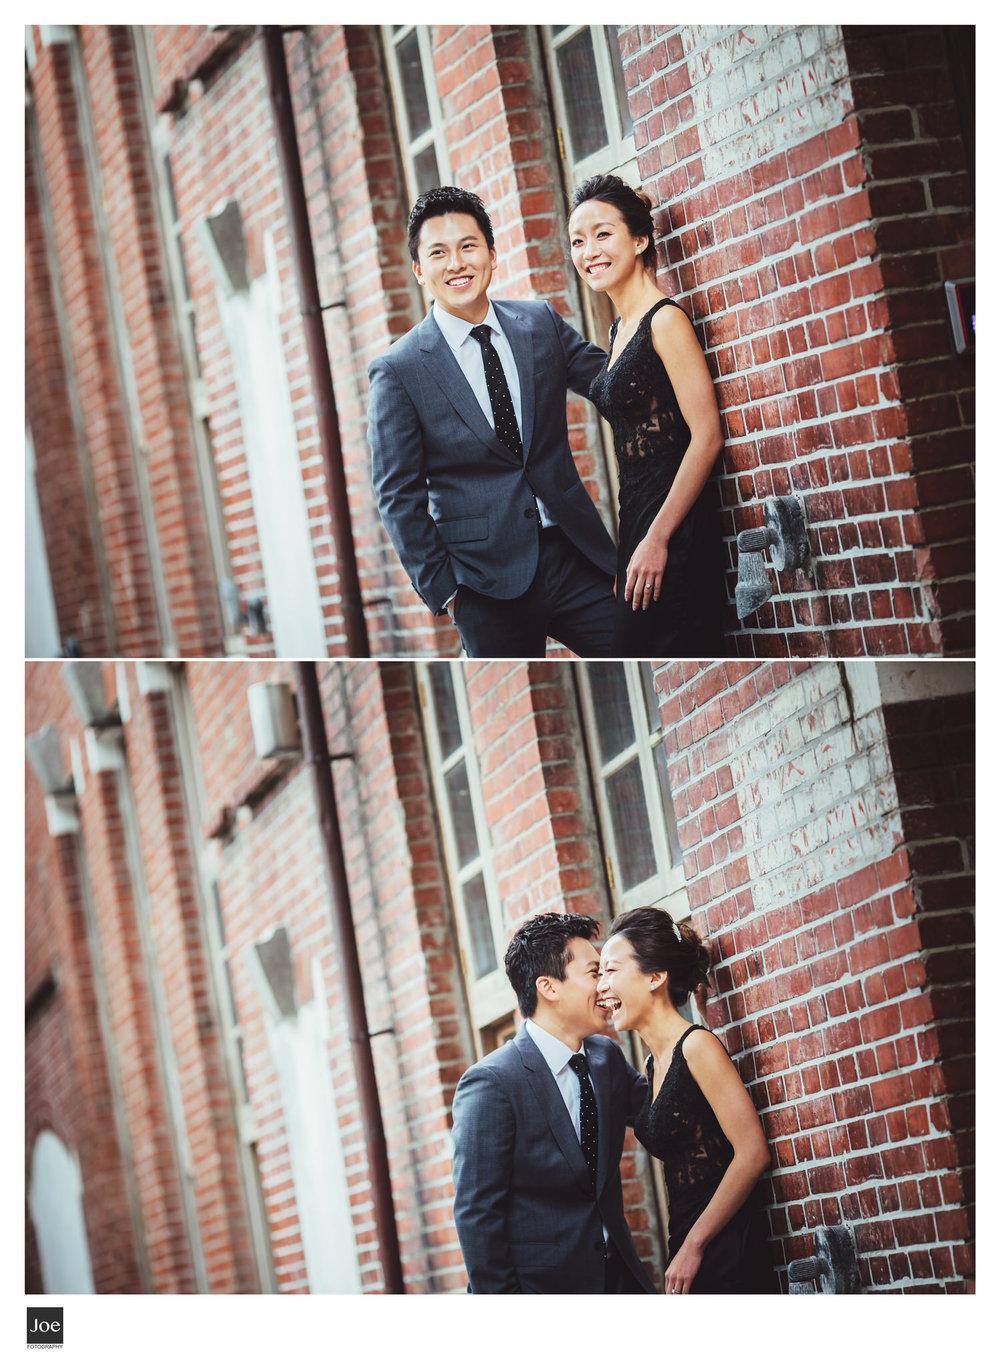 joefotography-taiwan-pre-wedding-annie-aaron-08.jpg